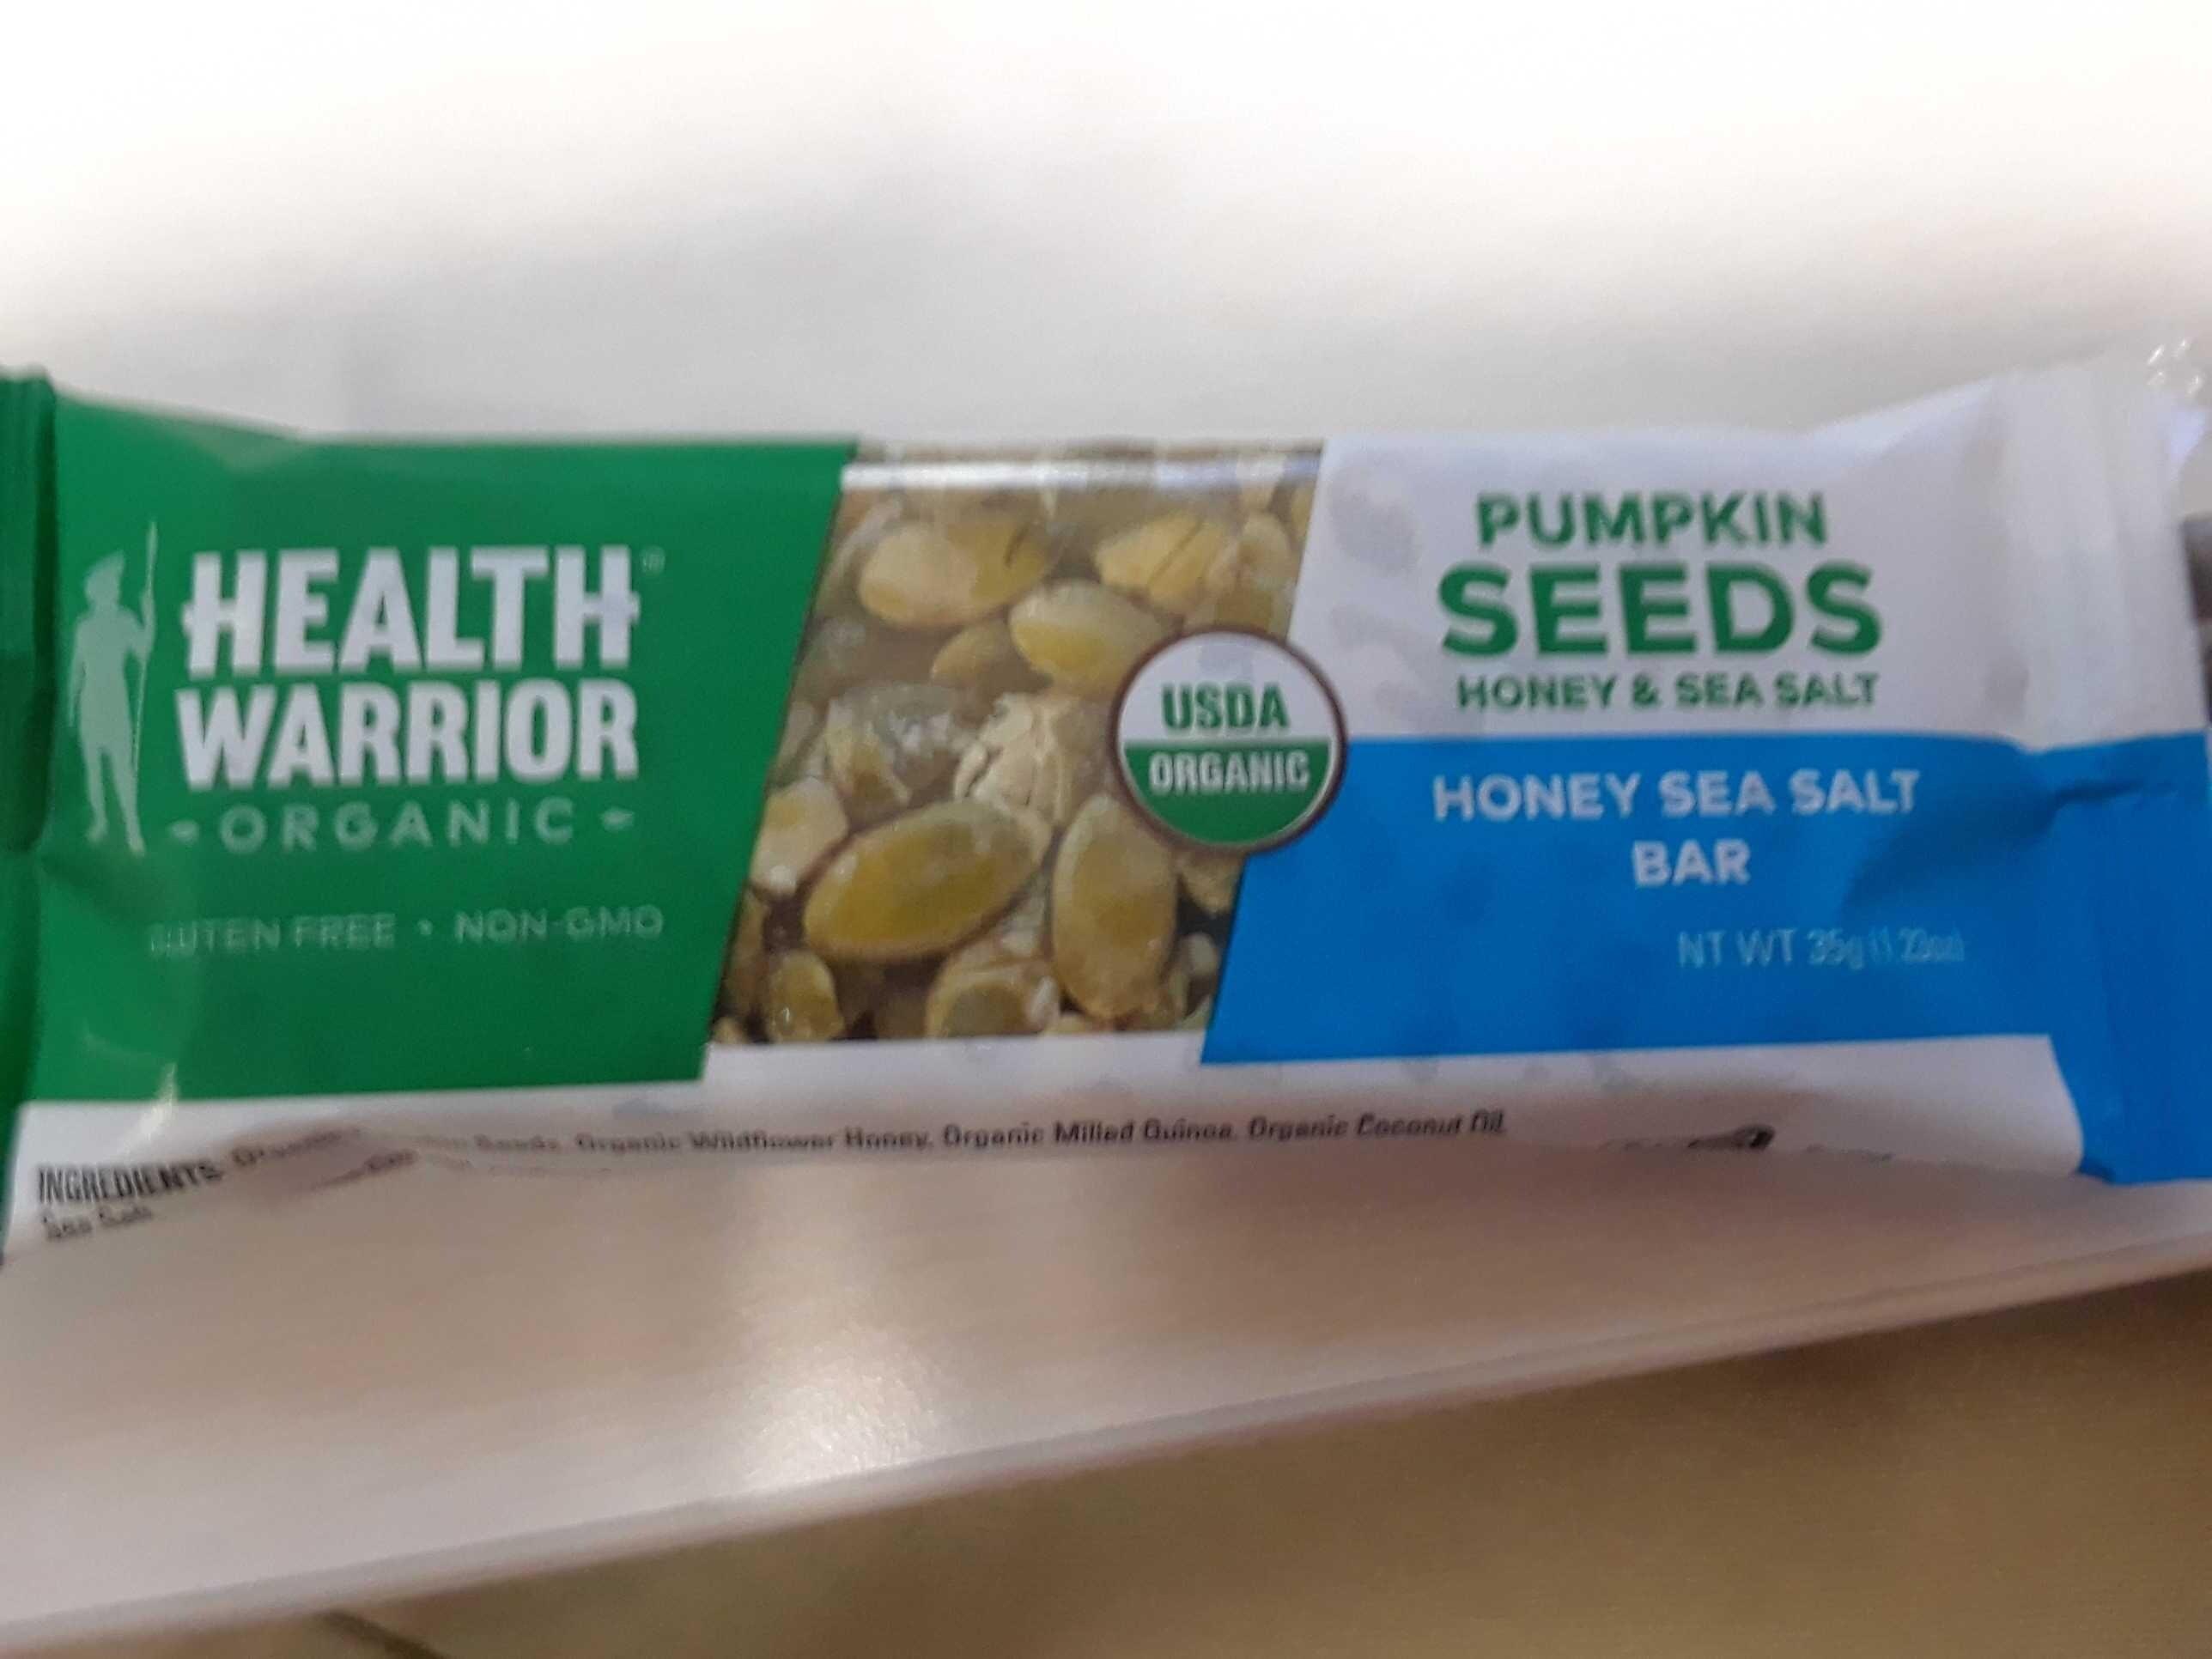 Pumpkin seed honey bar - Product